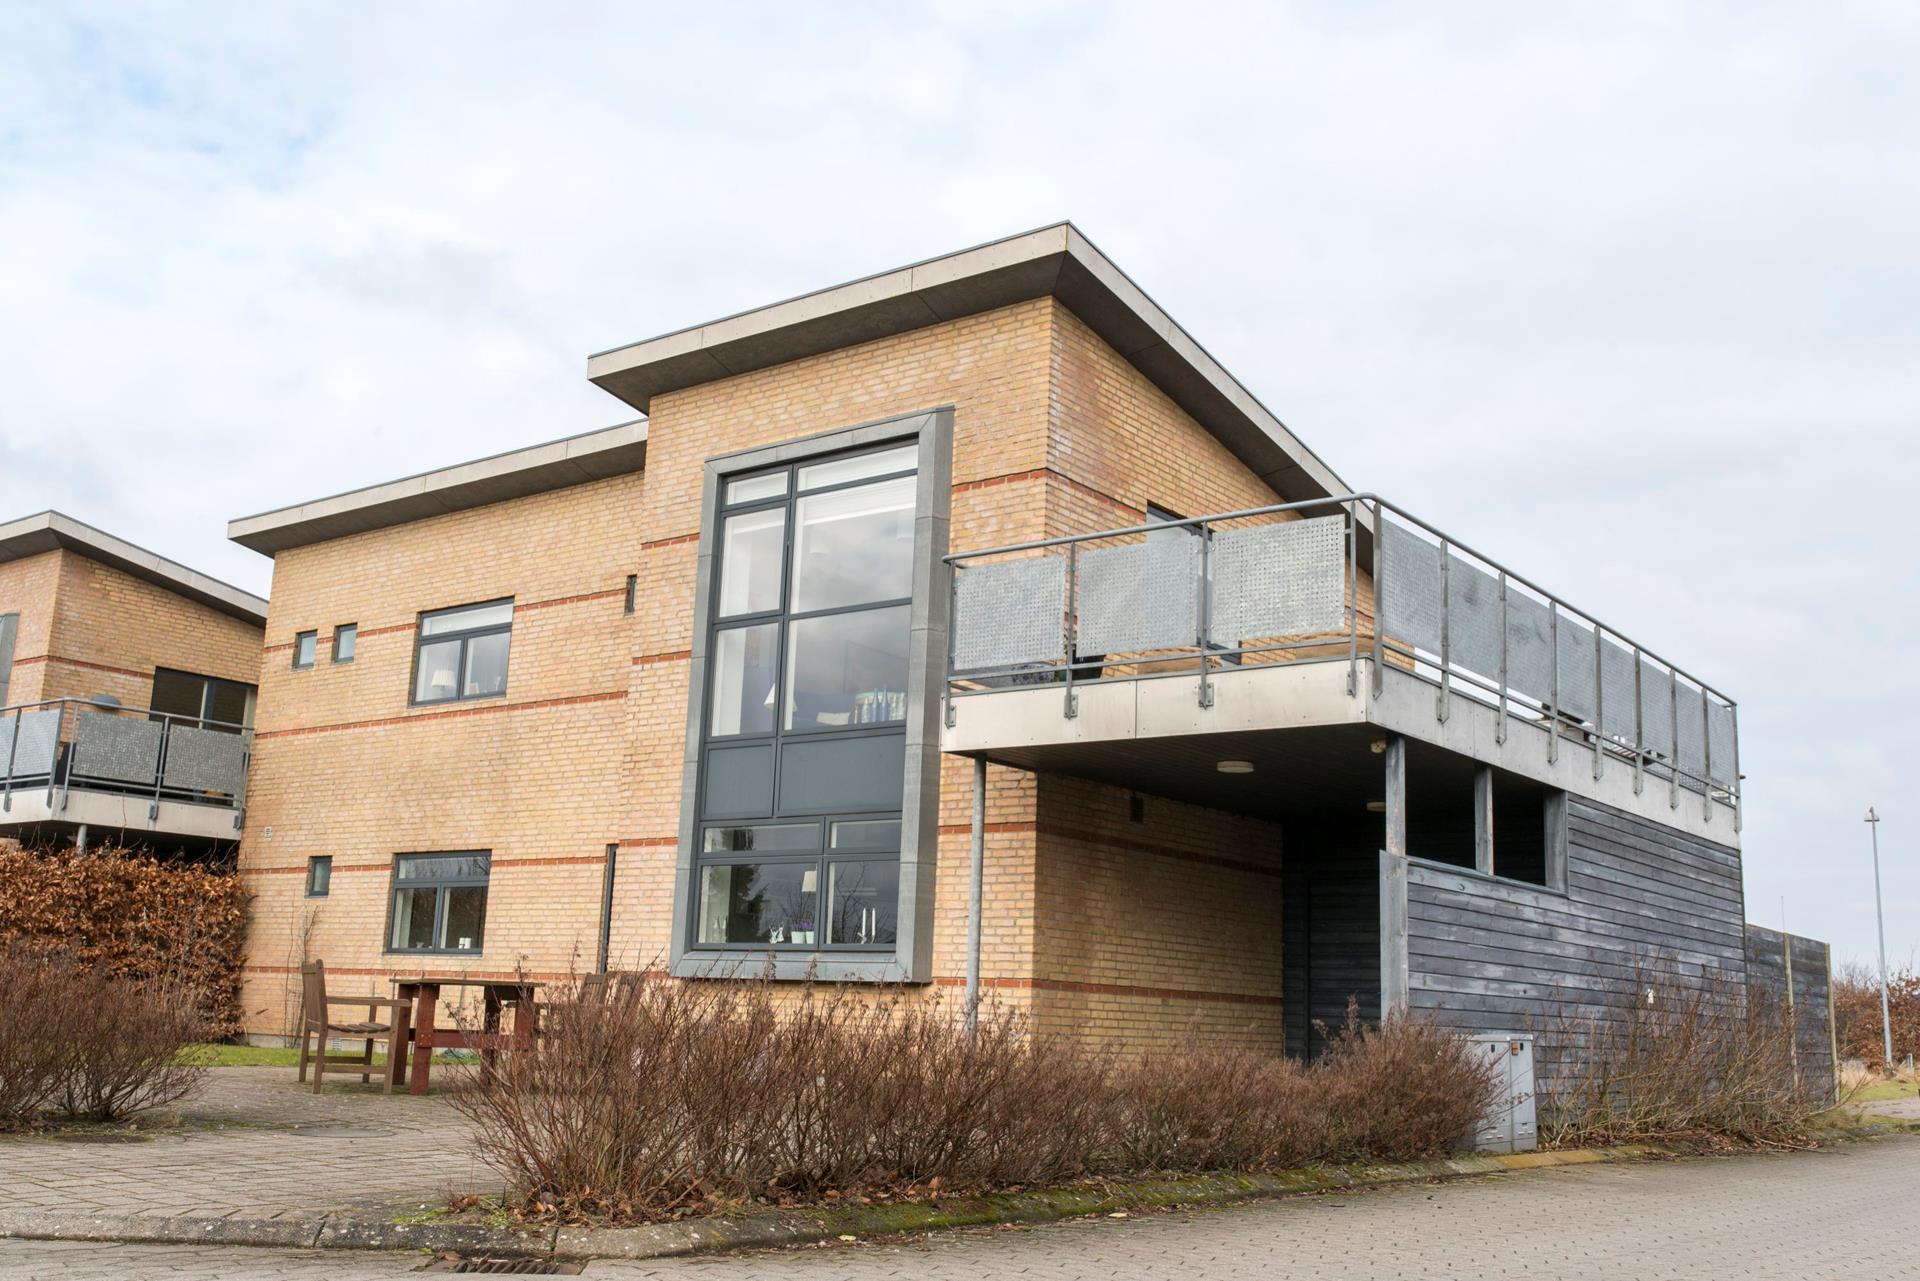 Rækkehus på Rølliken i Holstebro - Udendørs